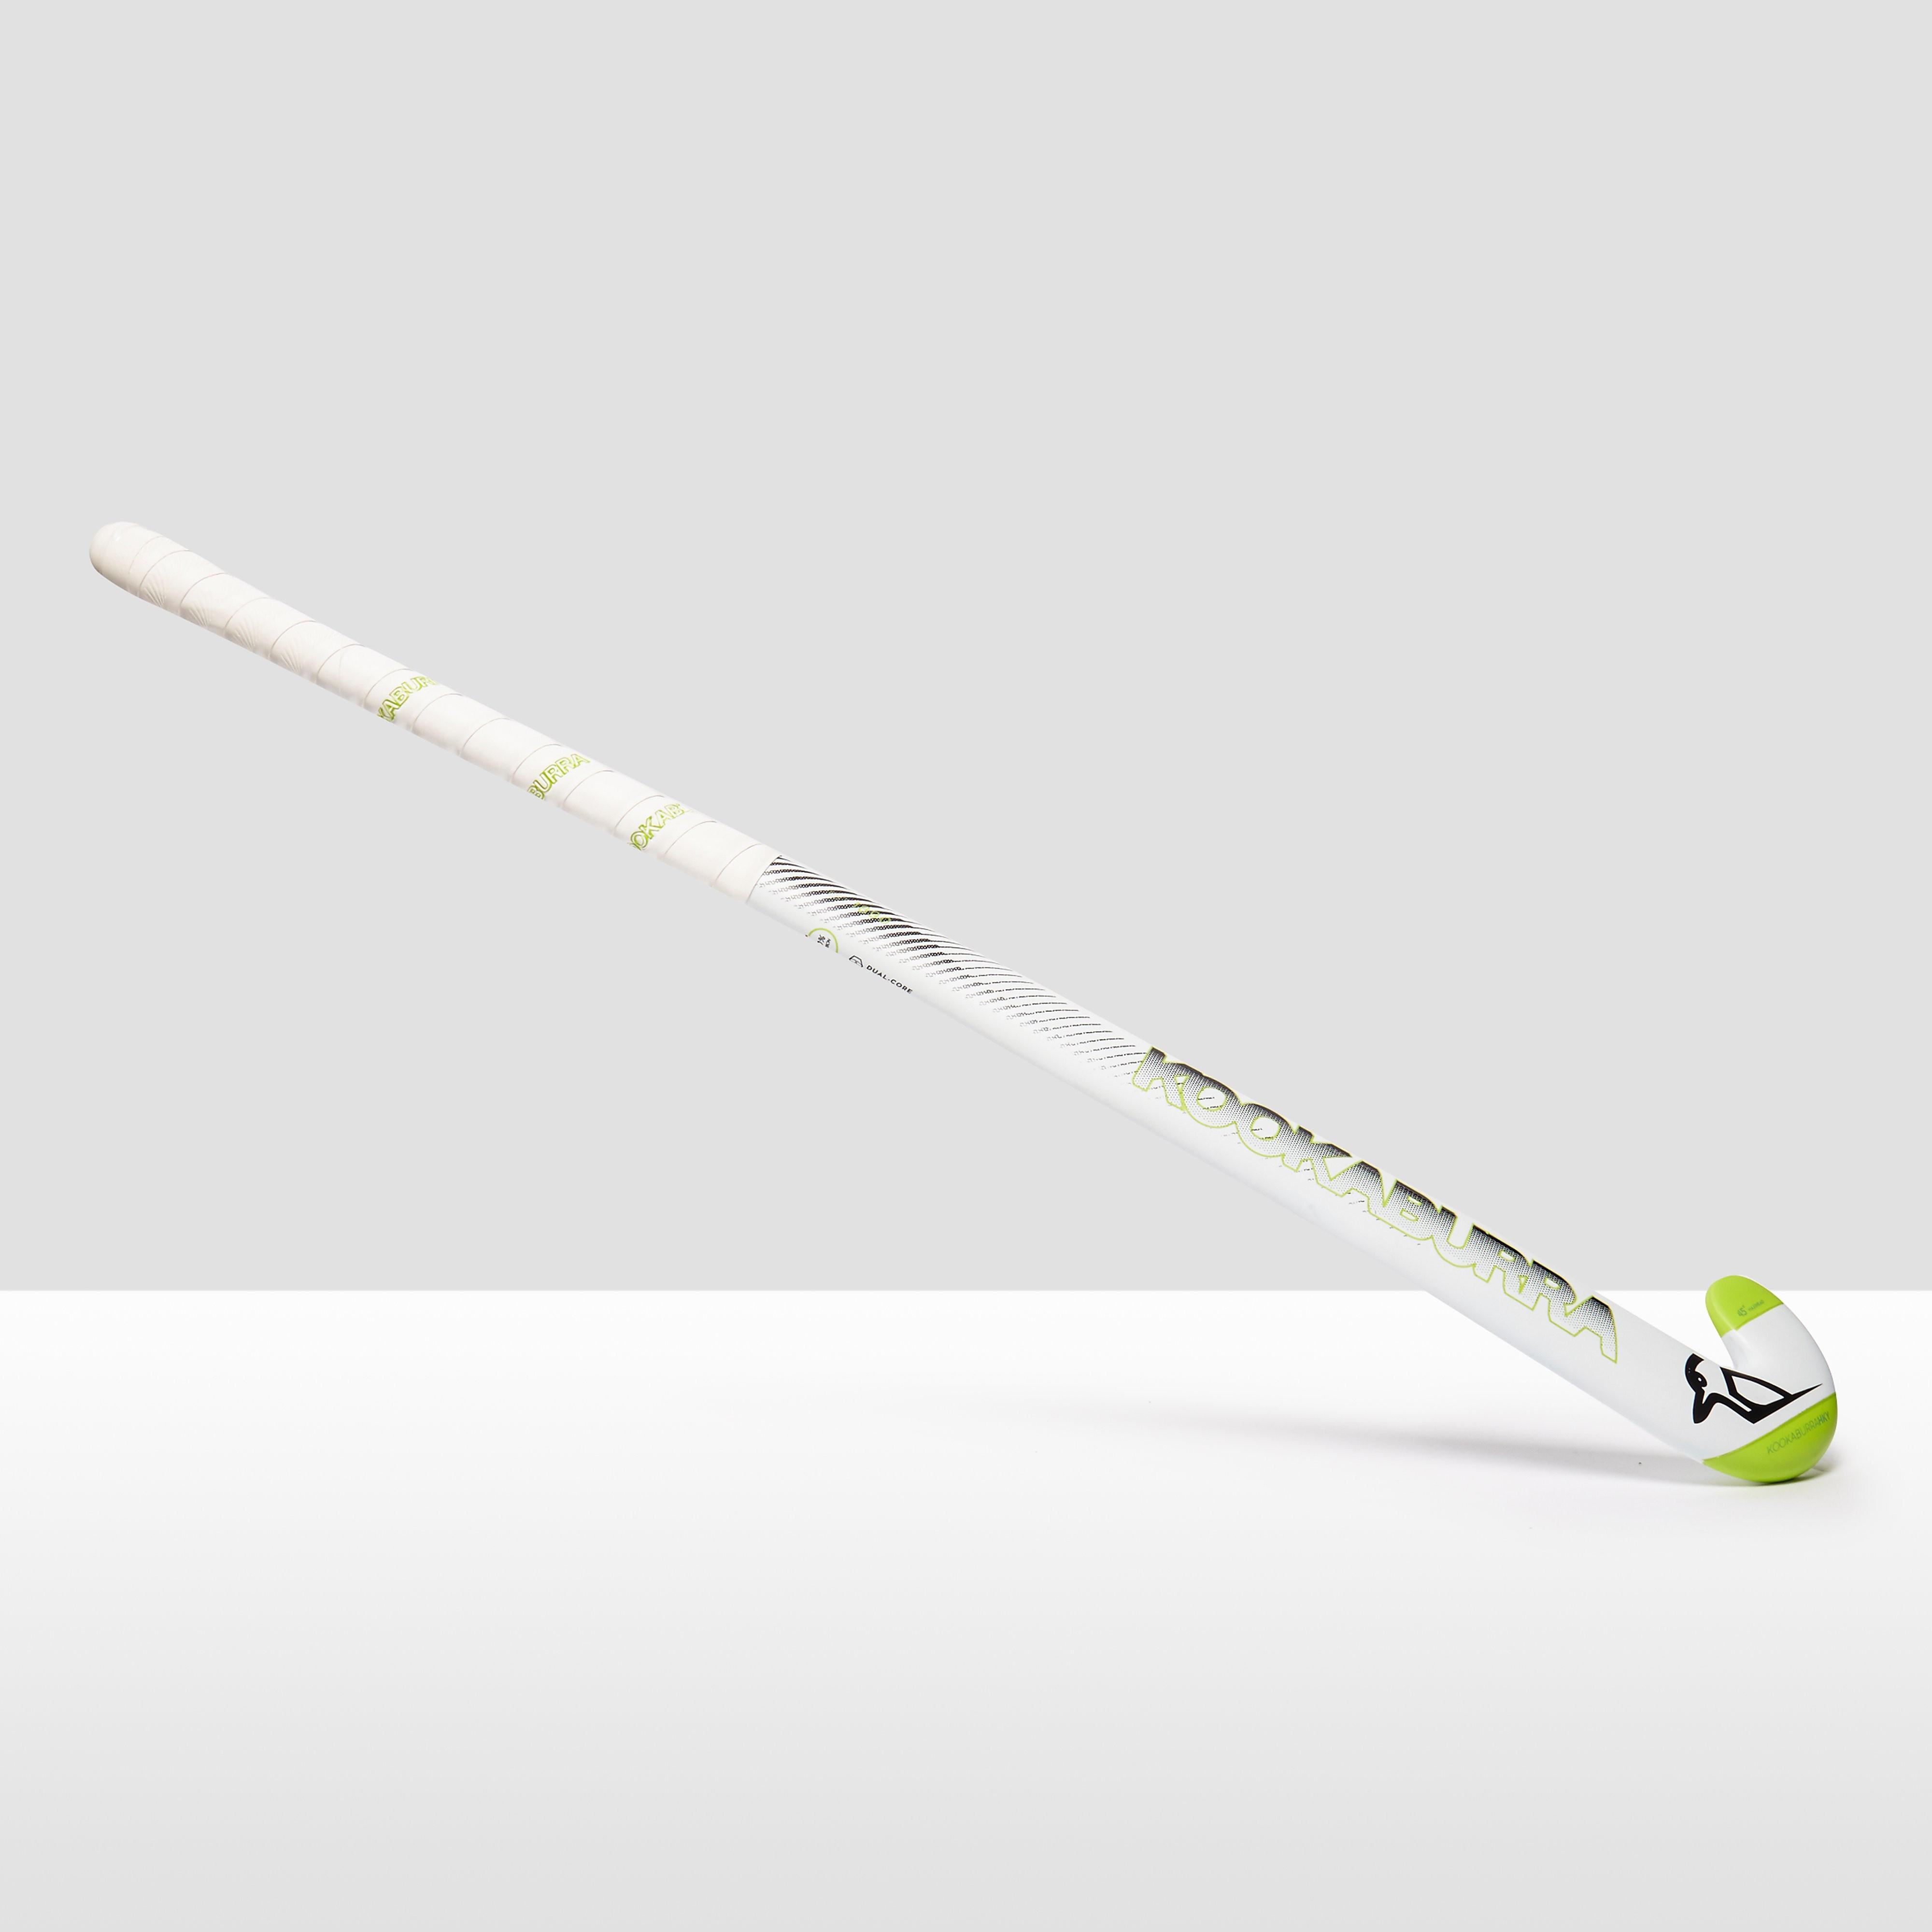 Kookaburra Composite Junior Hockey Stick